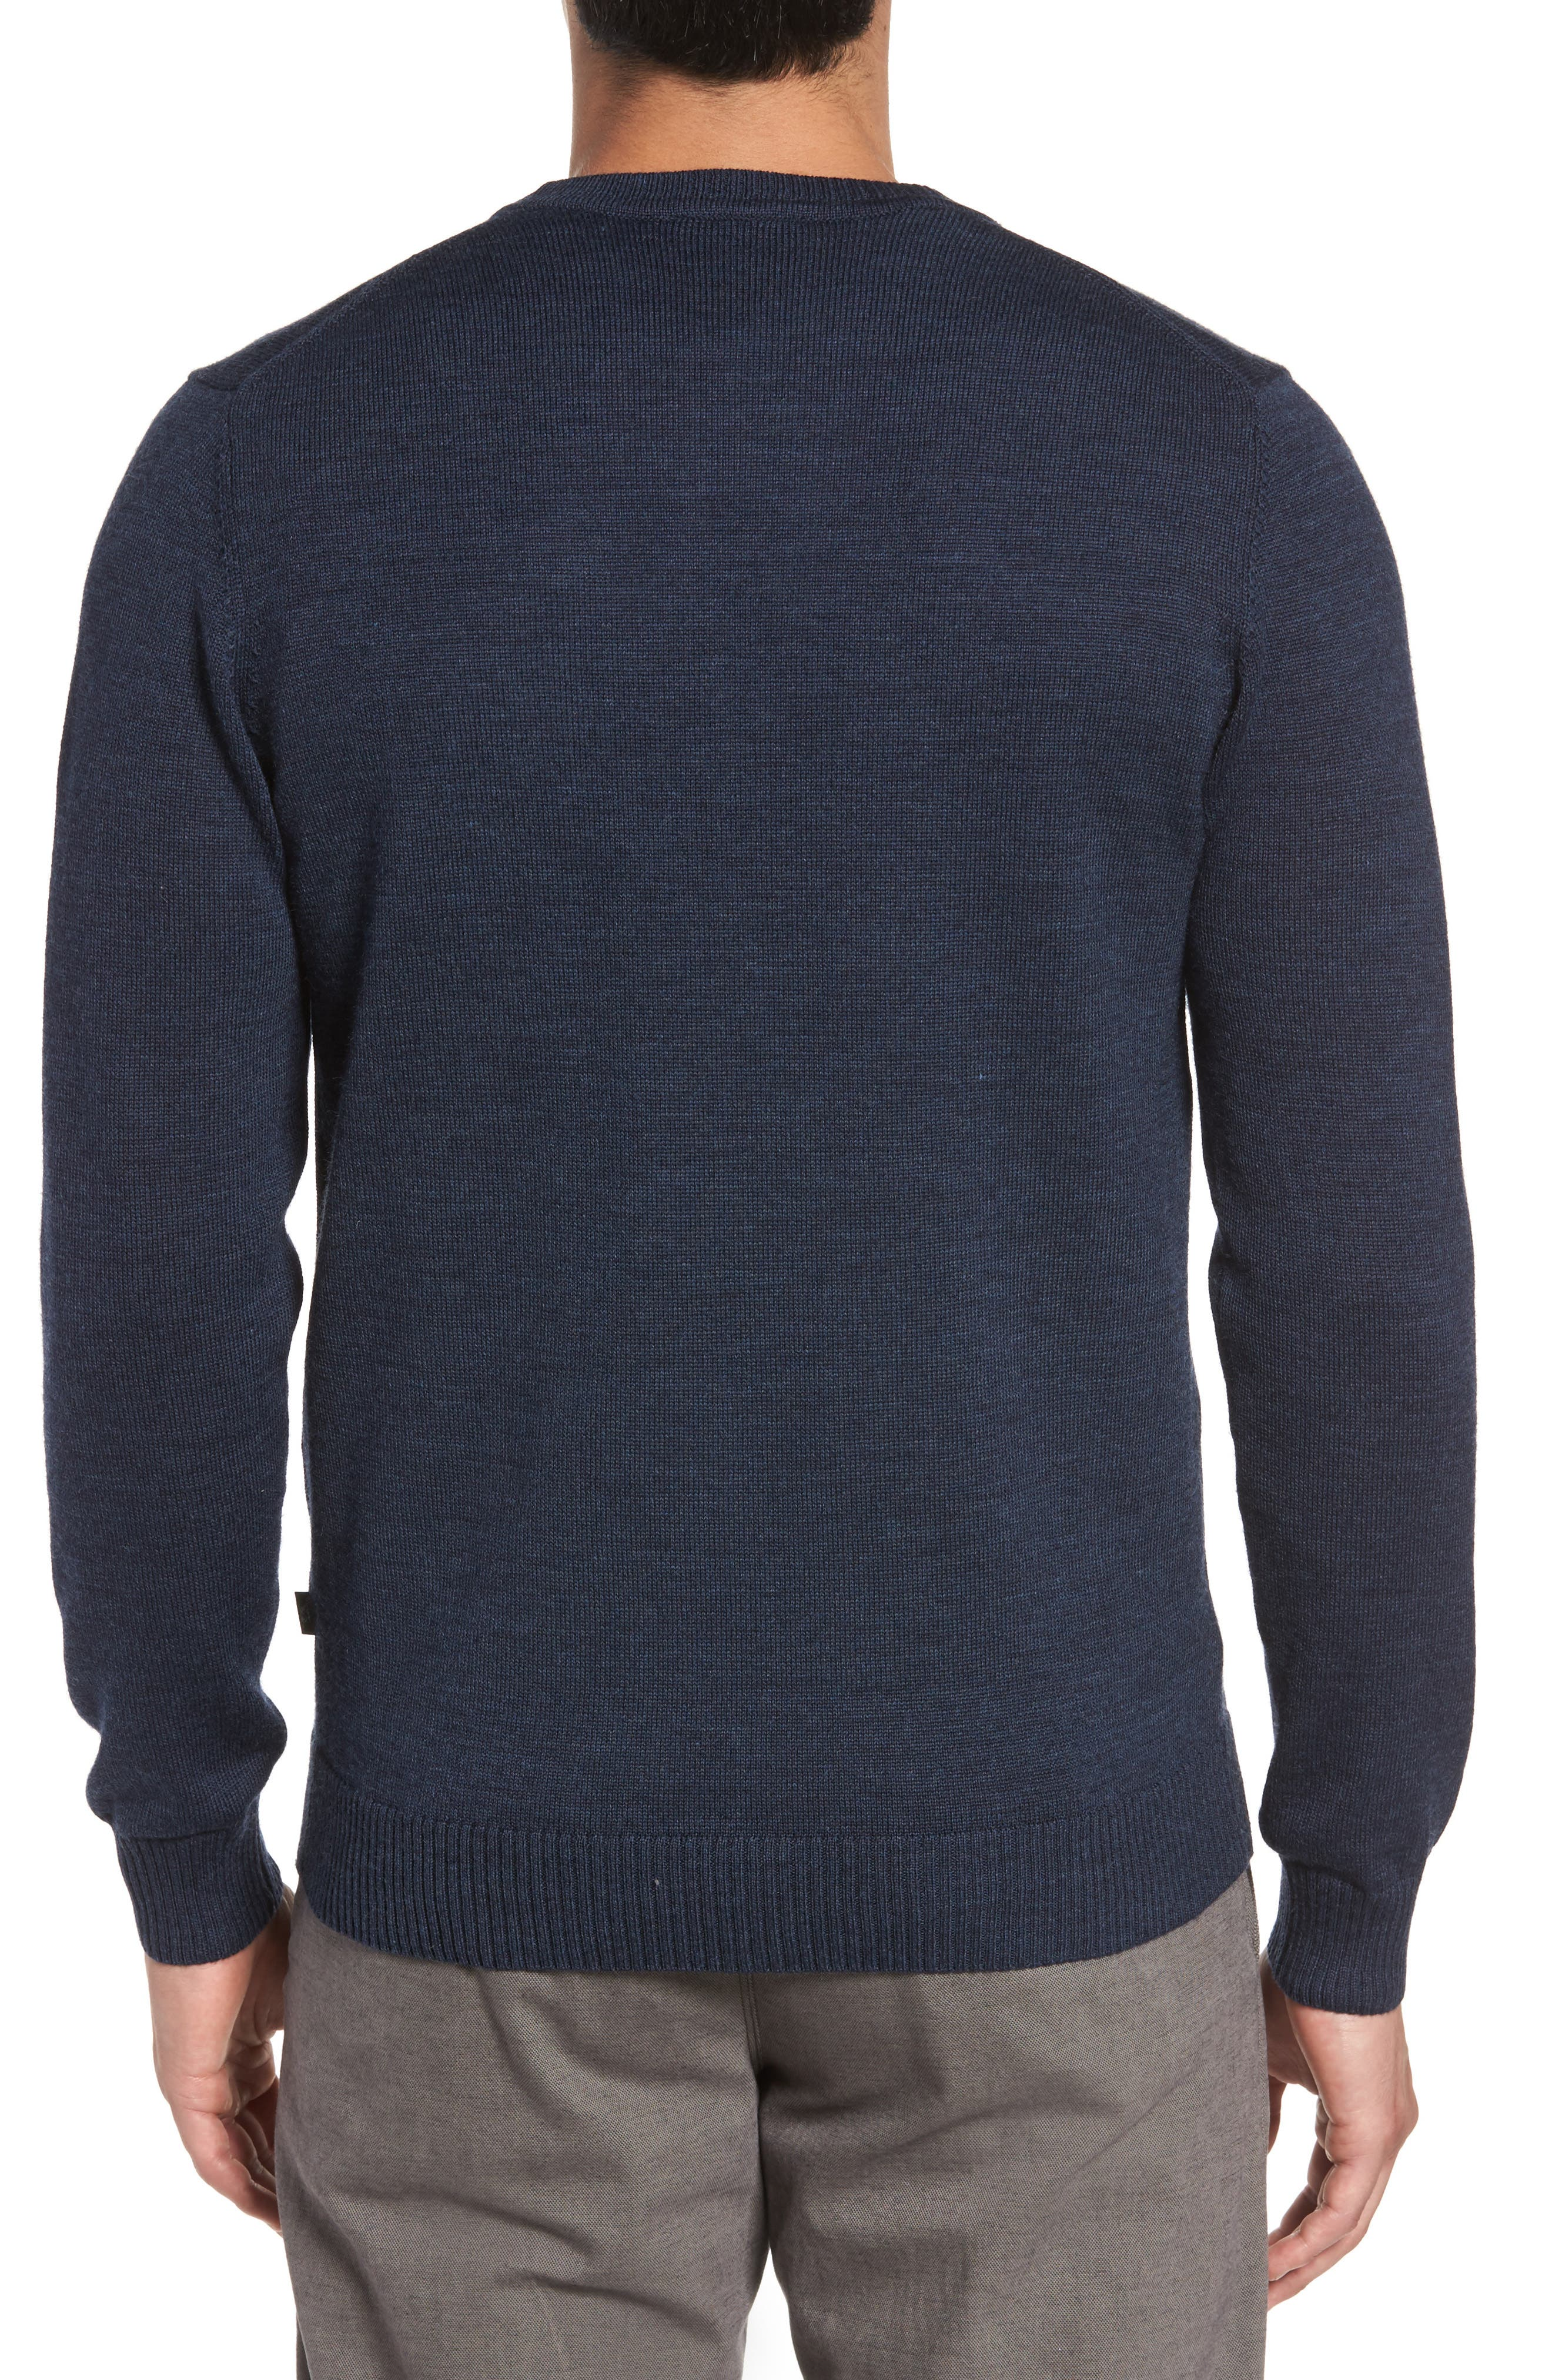 Bannockburn Mélange Merino Wool Sweater,                             Alternate thumbnail 2, color,                             Ink